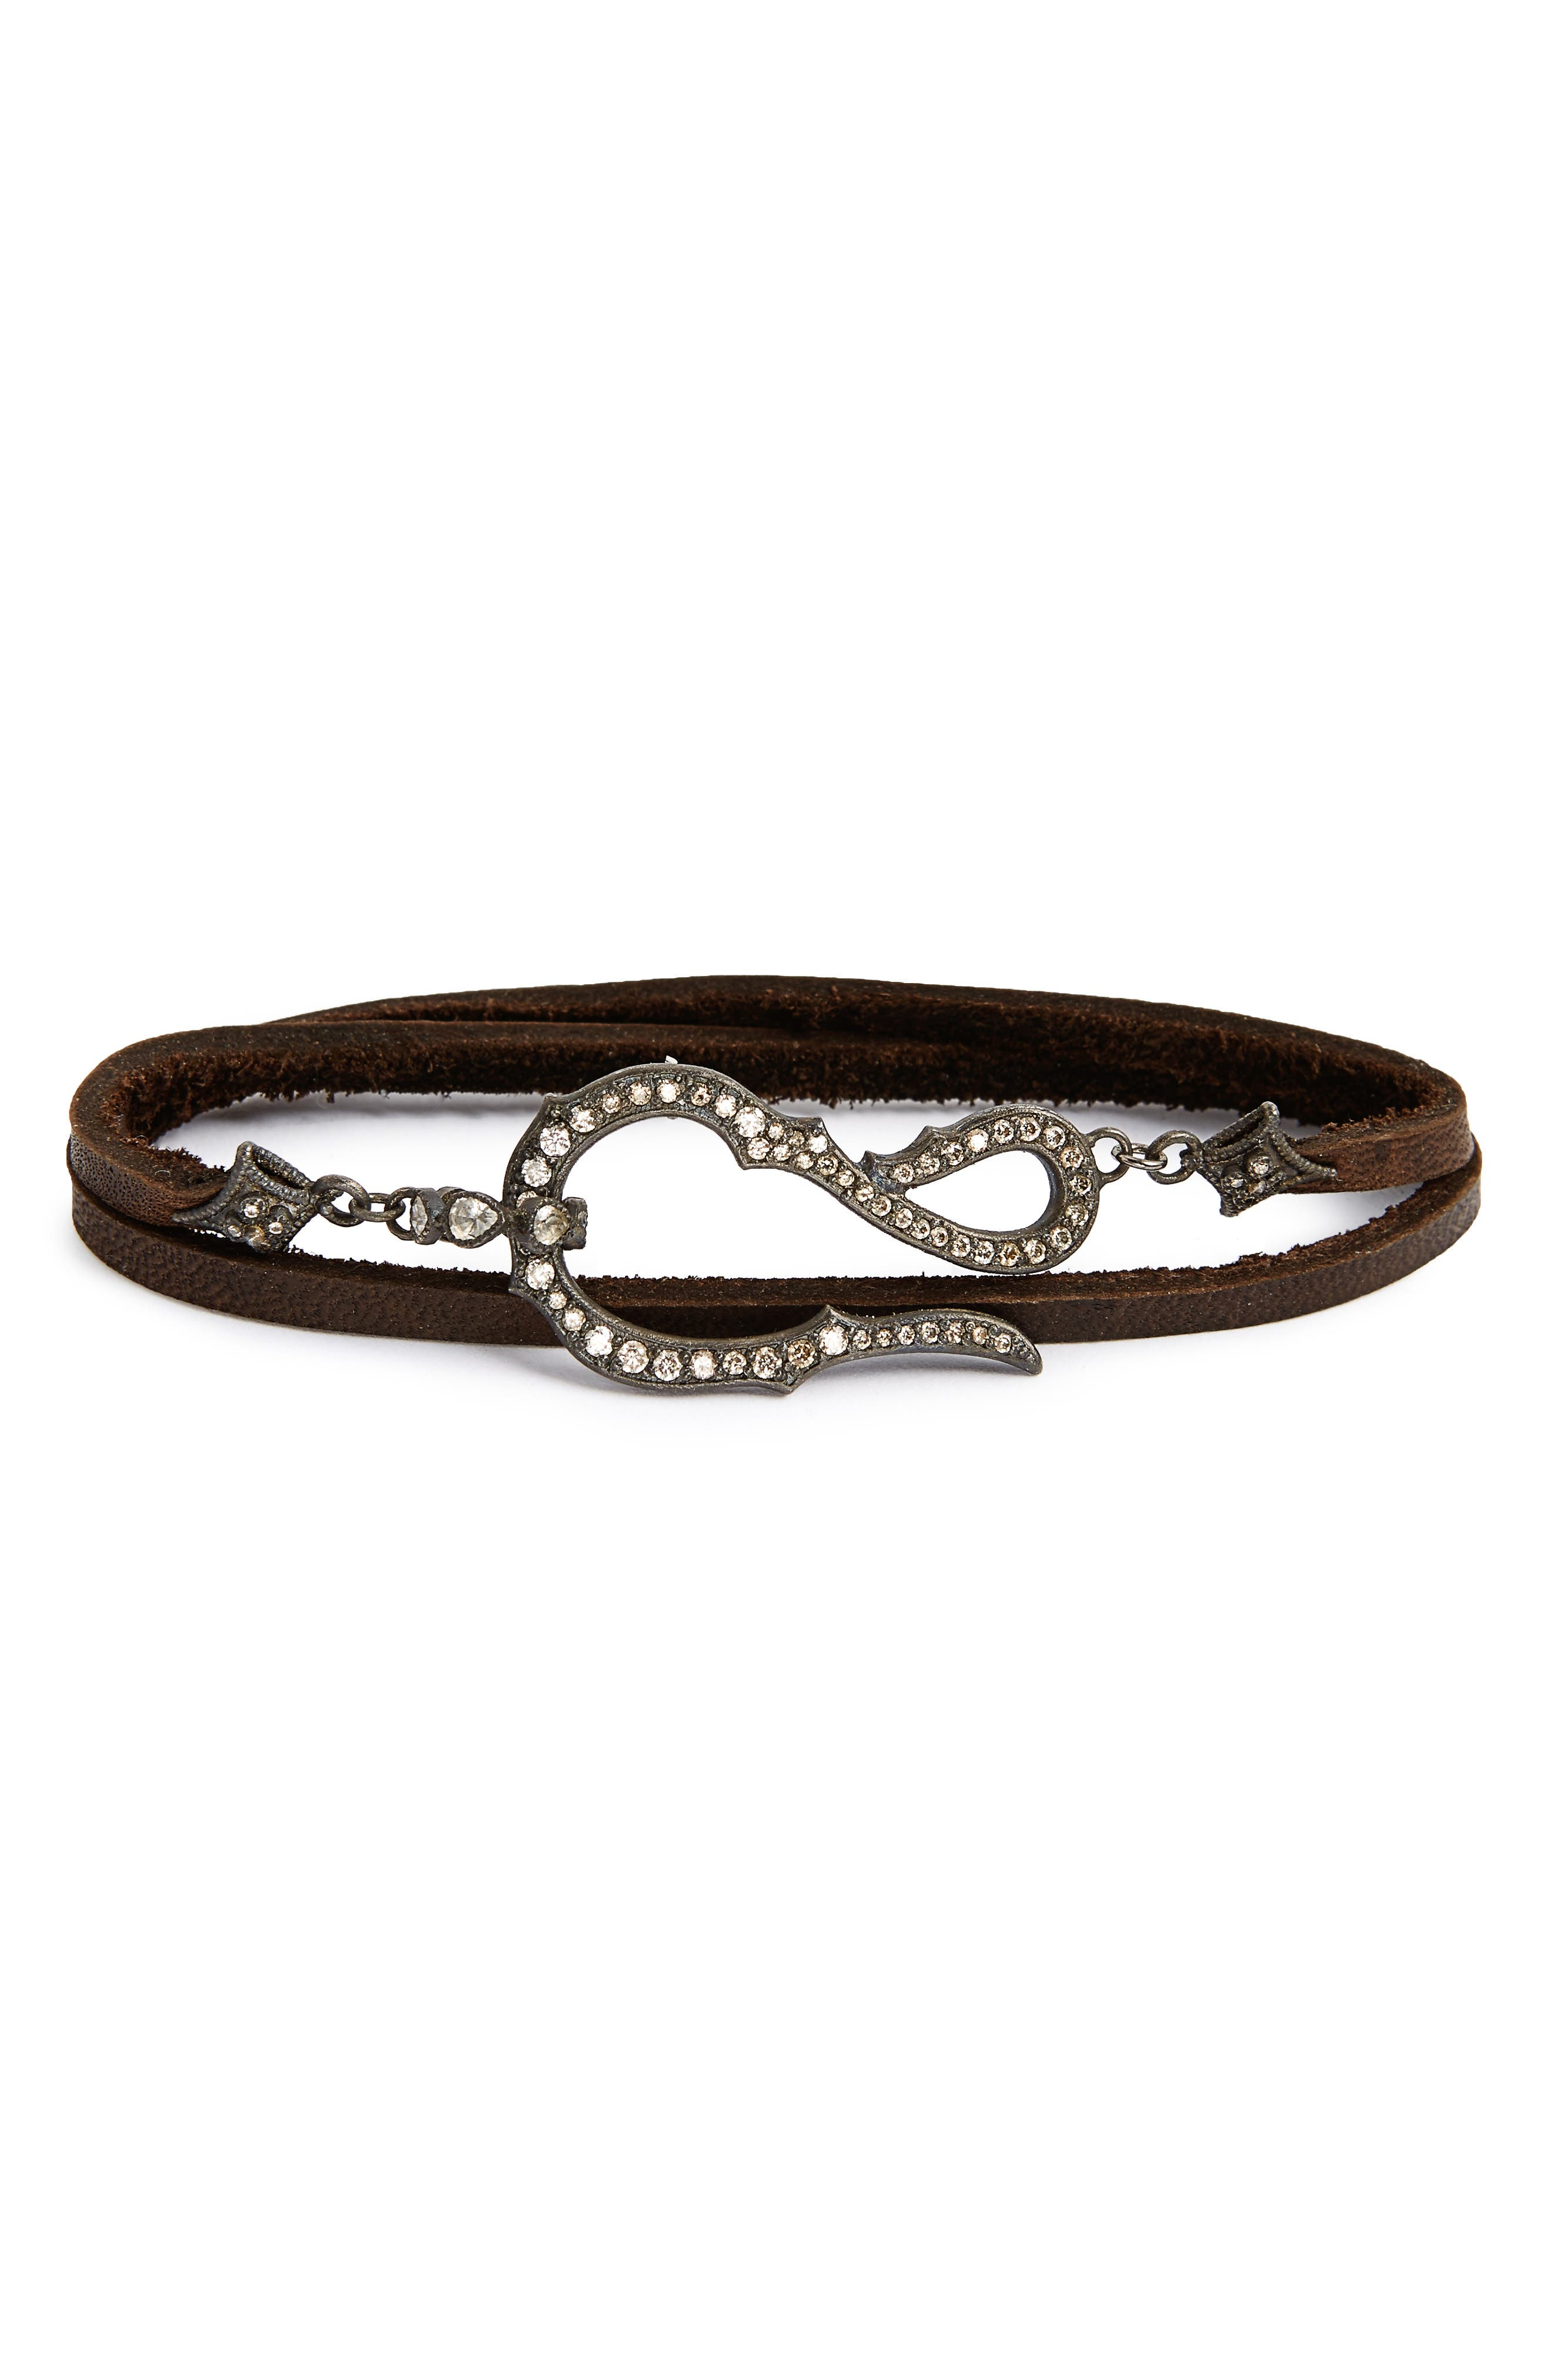 Old World Midnight Leather & Diamond Wrap Bracelet,                         Main,                         color, Black